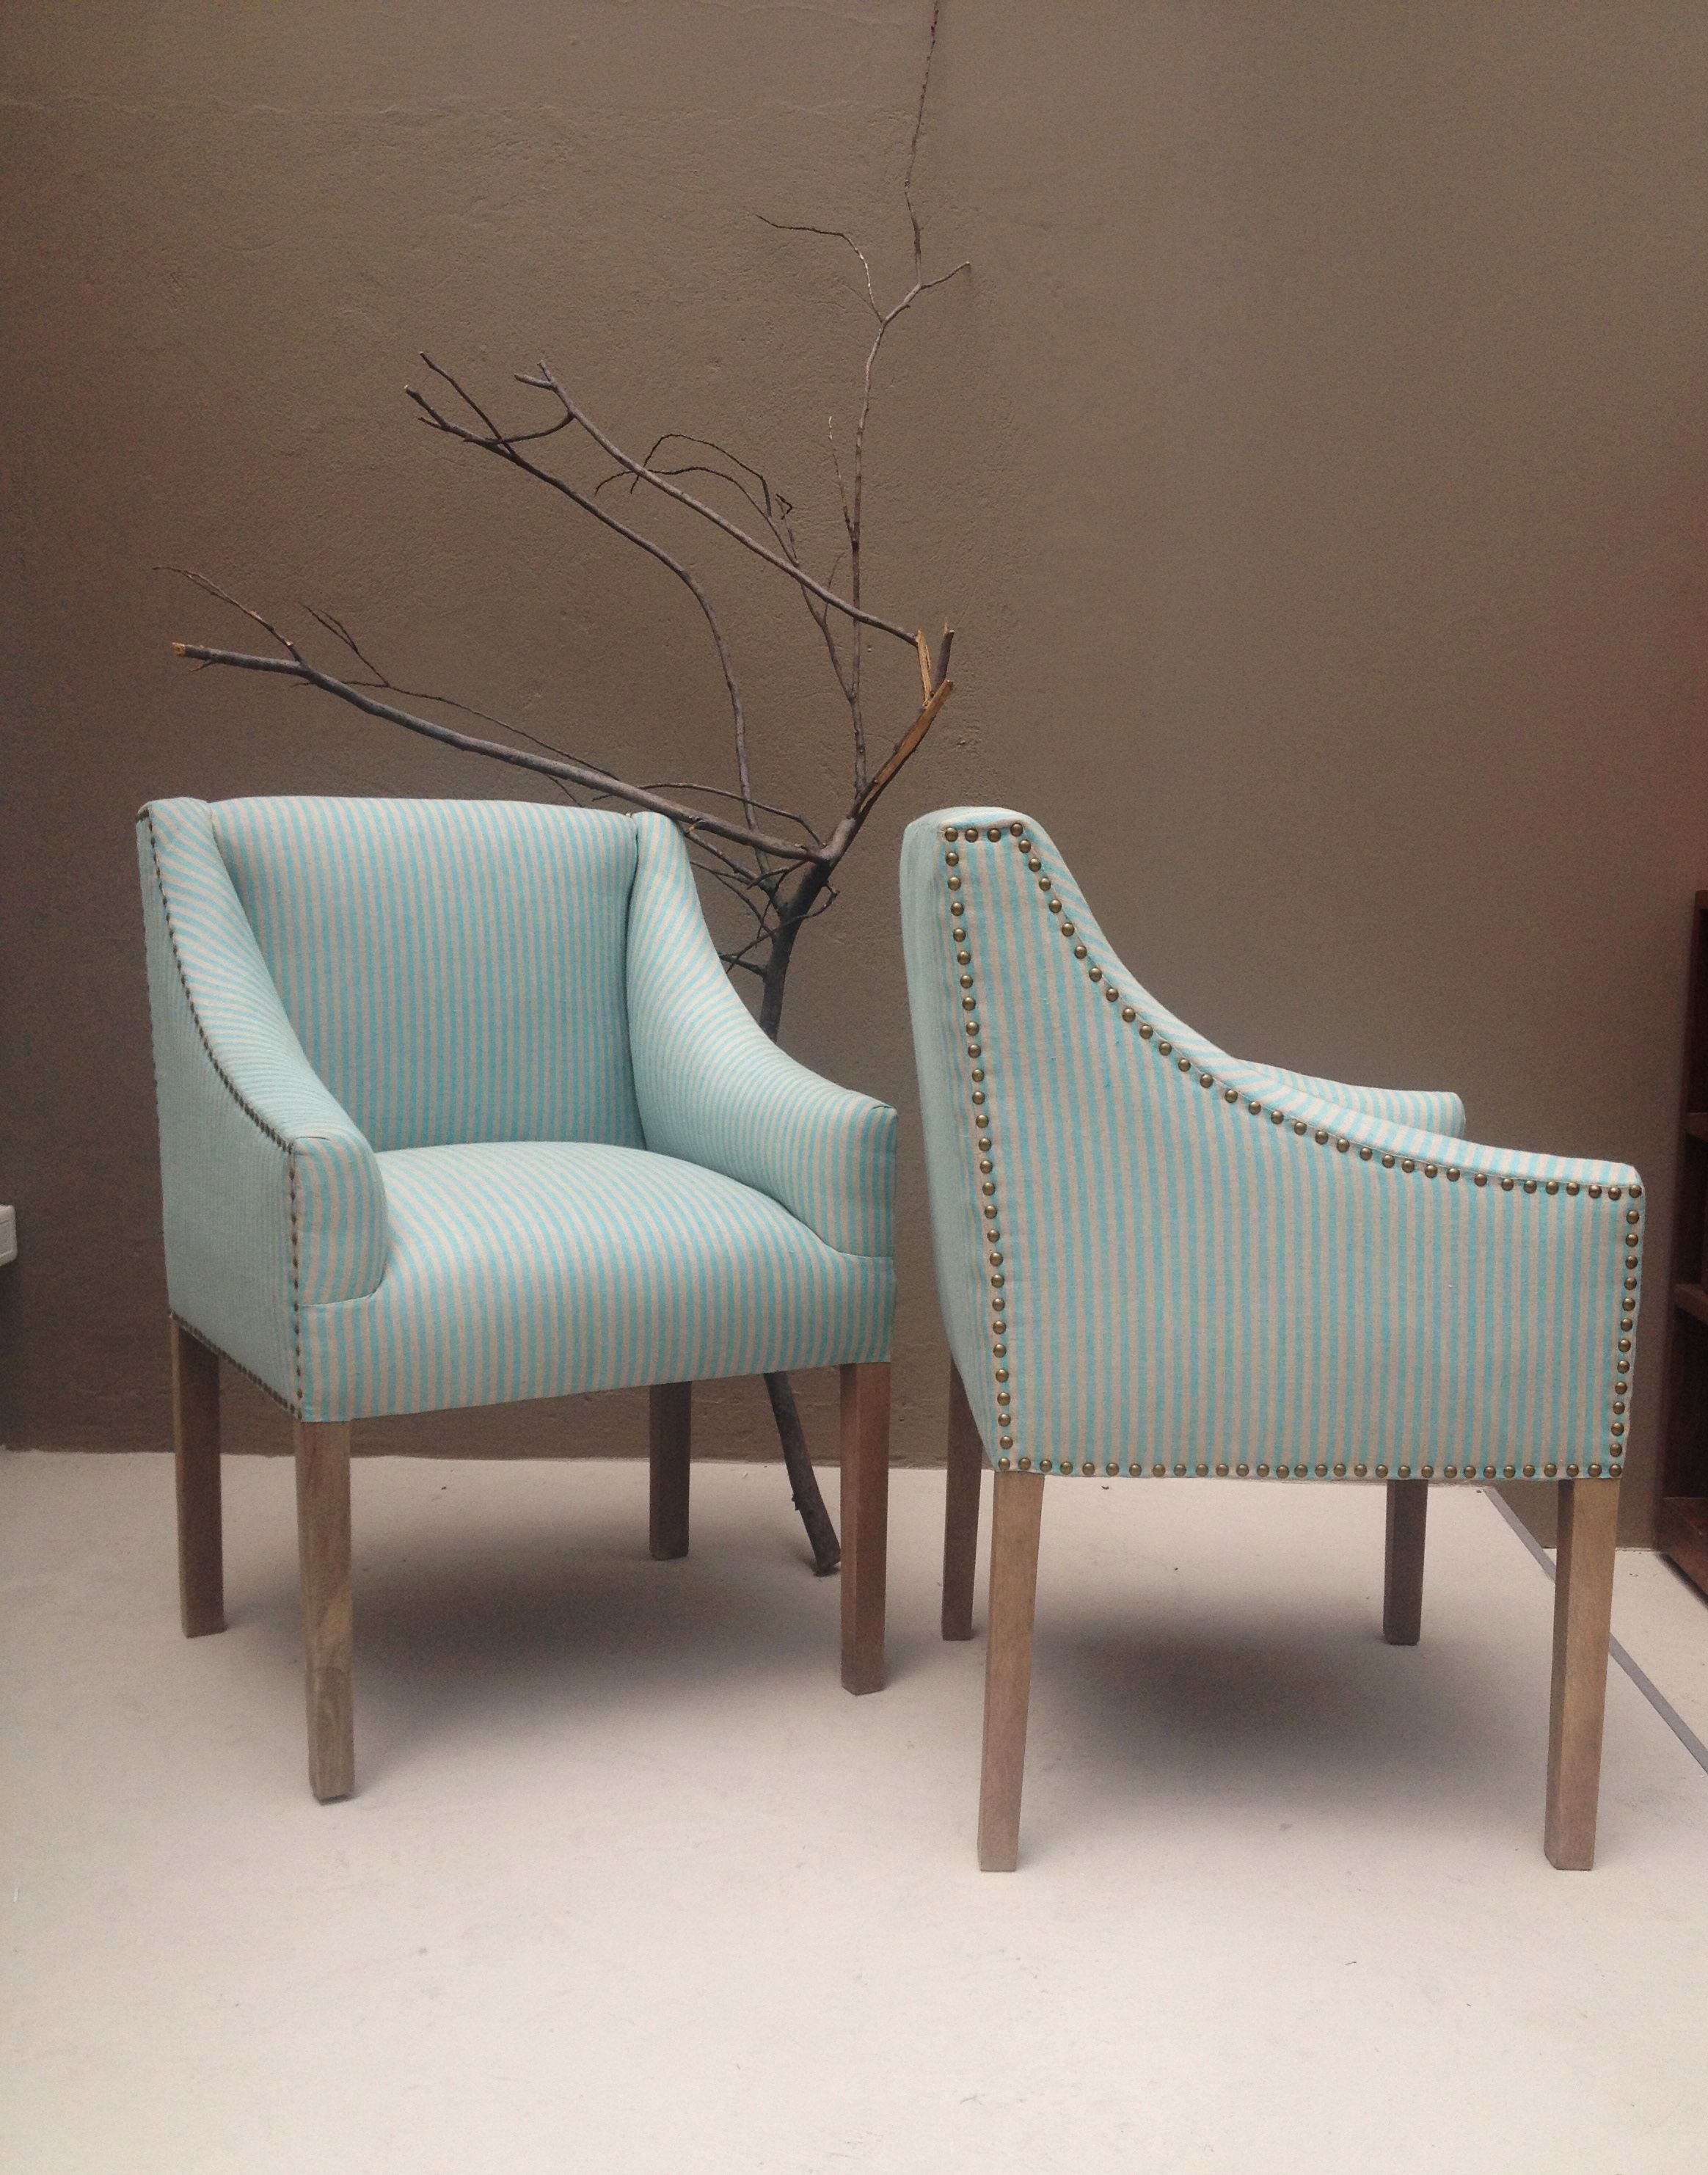 sillas auxiliares sillas comedor pinterest sillas